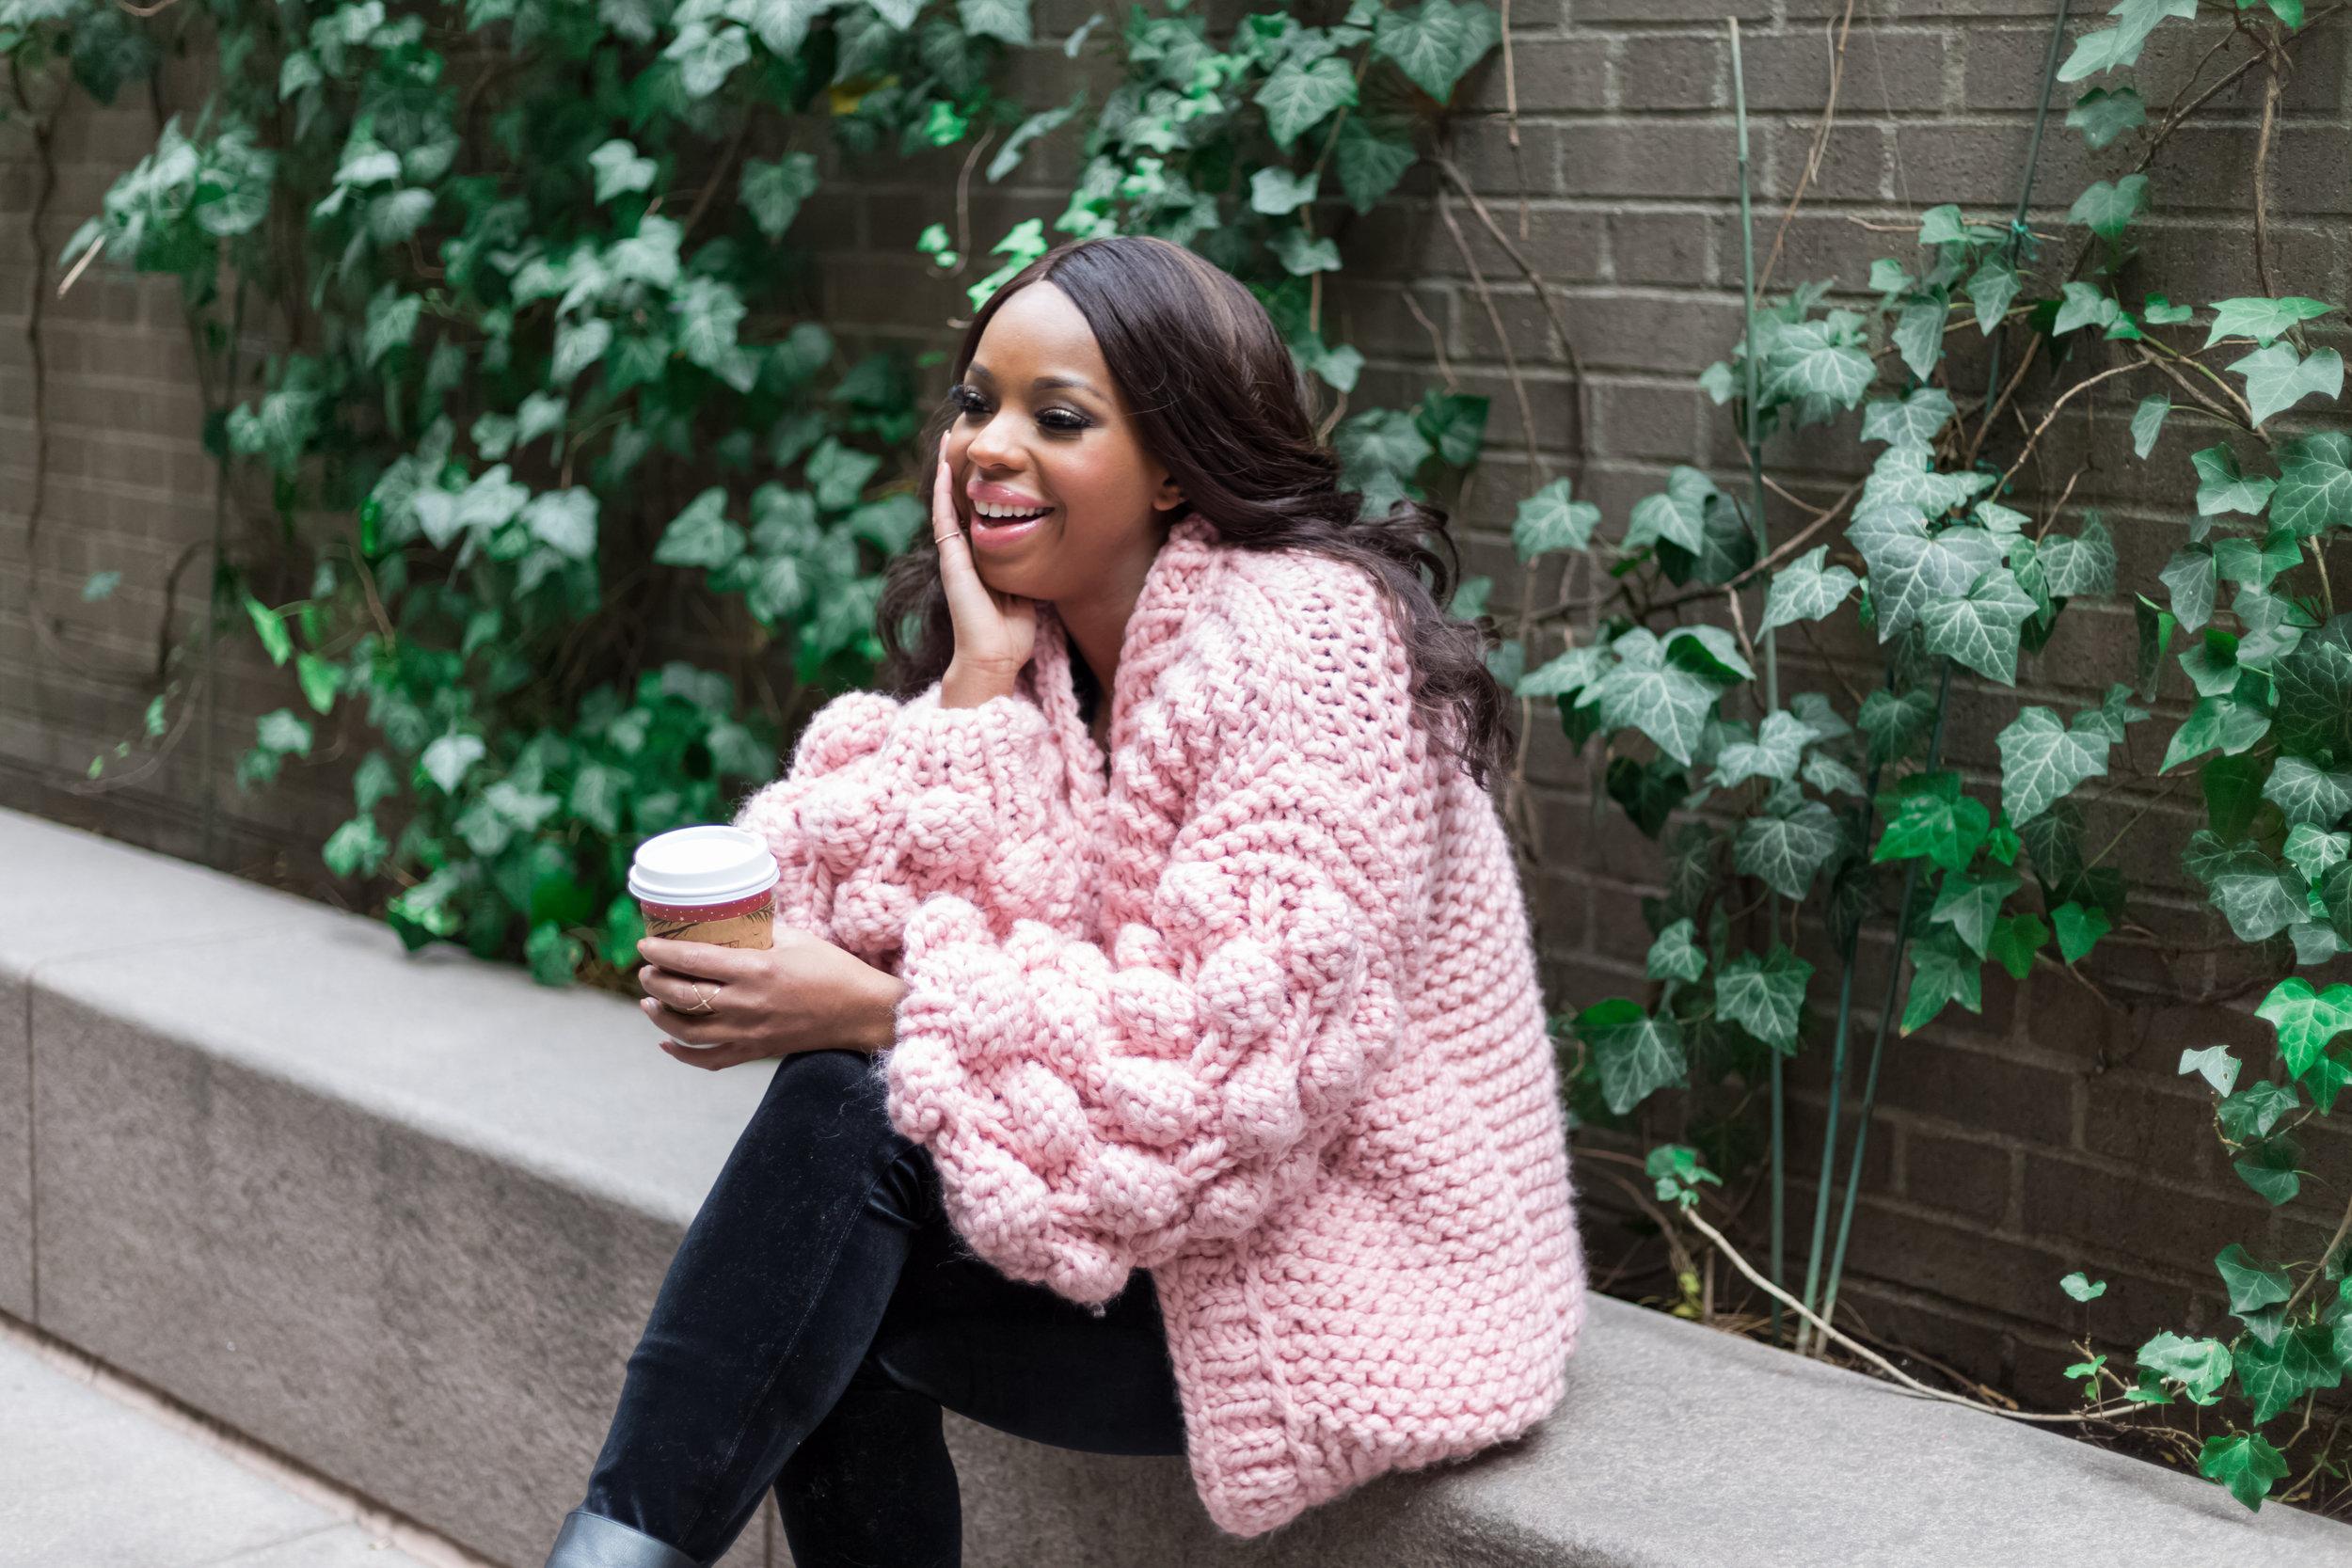 Handmade-Cozy-Knit-Sweater